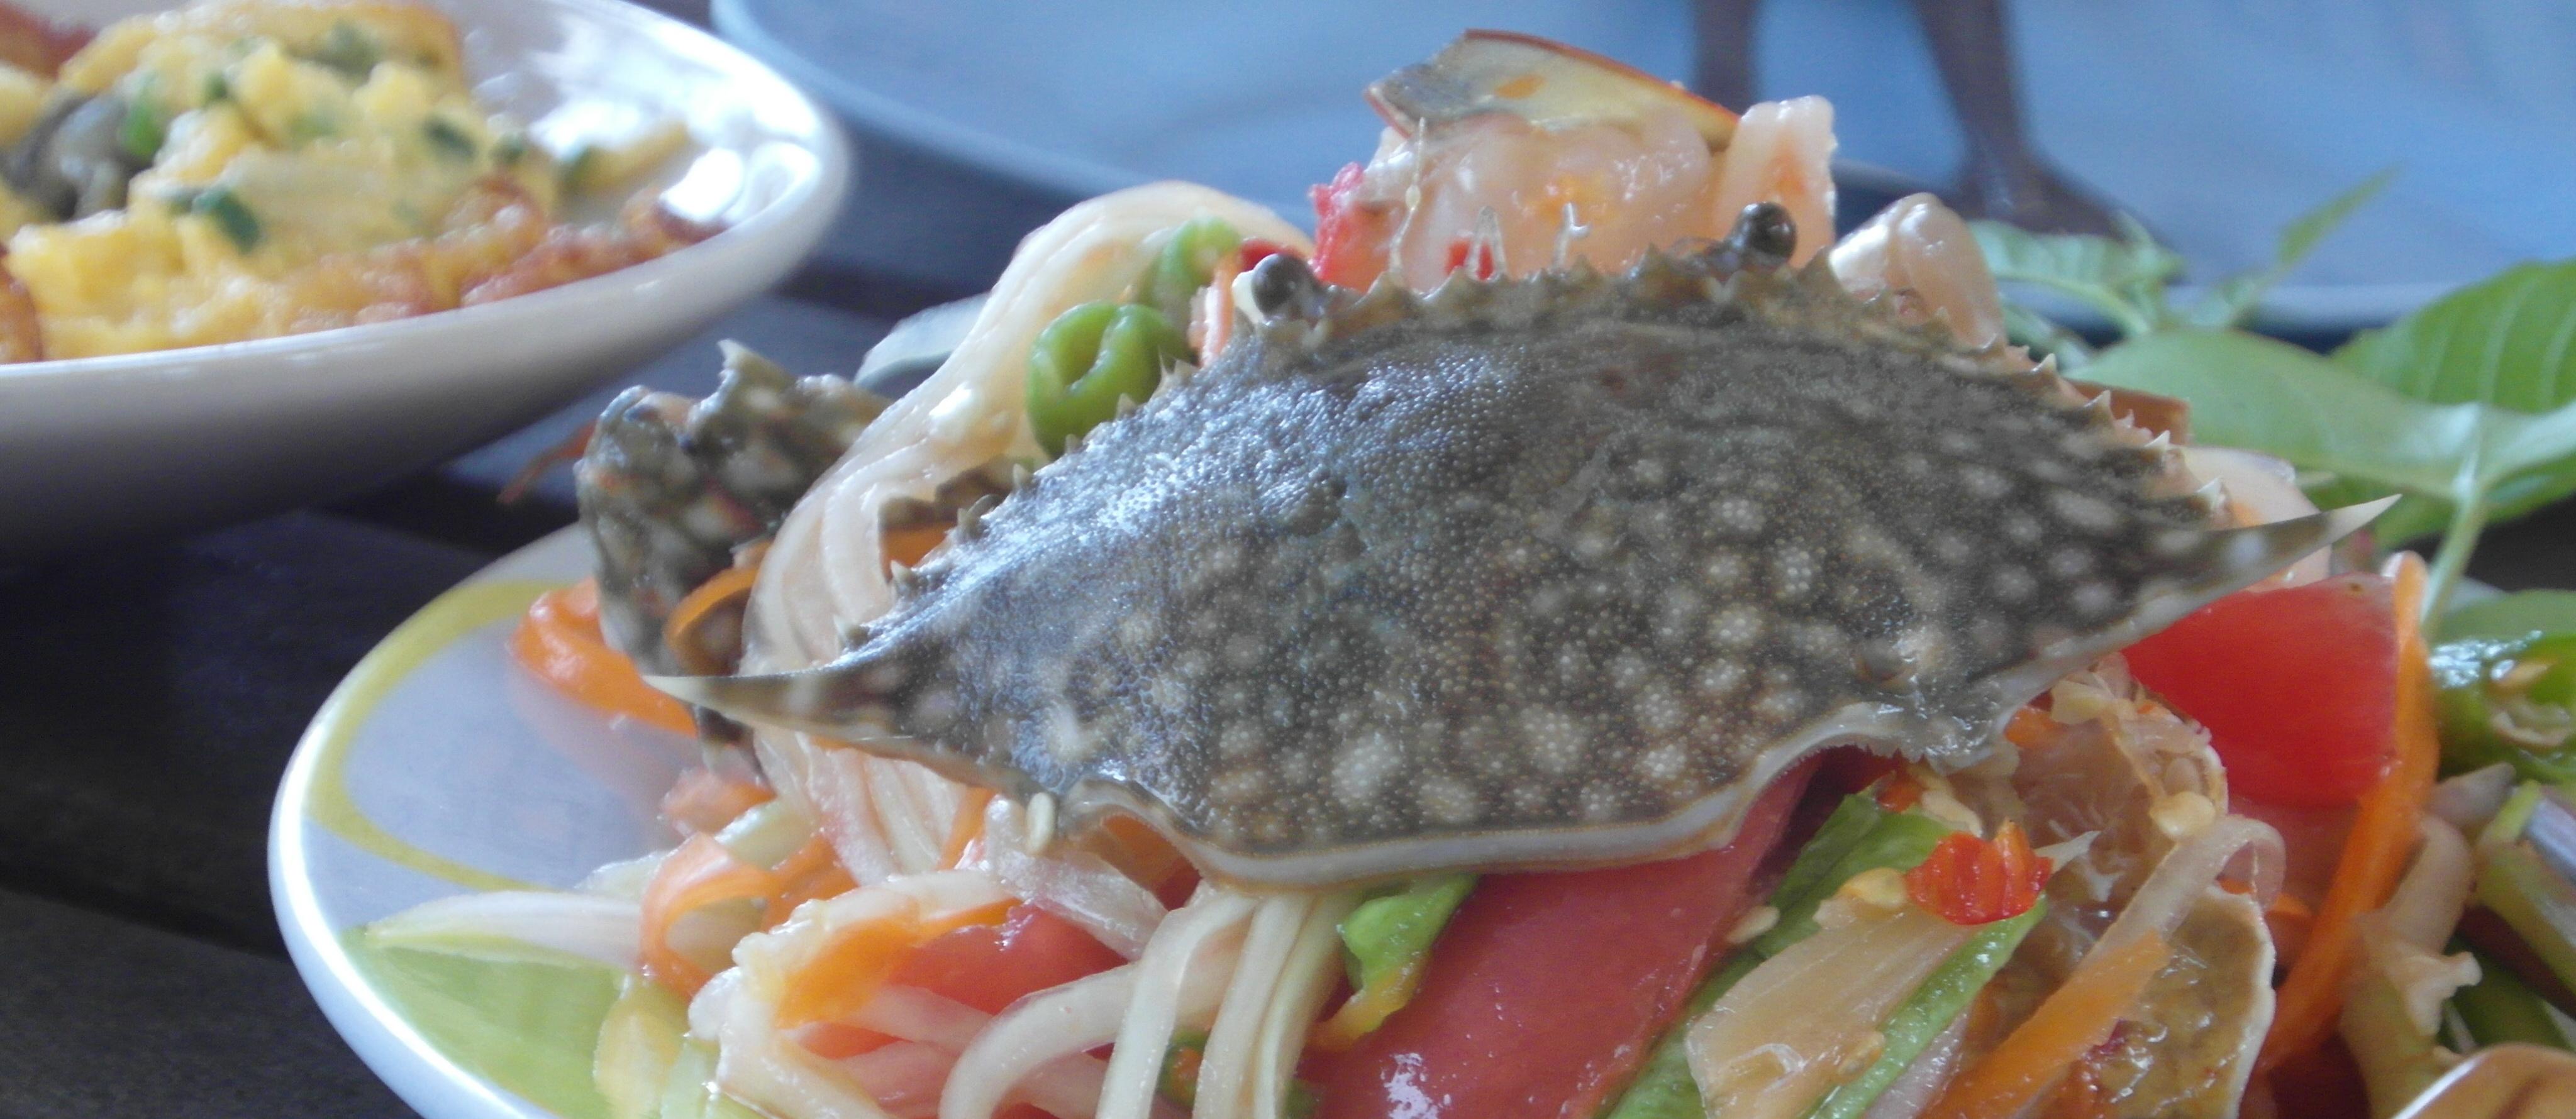 Sushi Crab Salad, Closeup, Oriental, Traditional, Sushi, HQ Photo